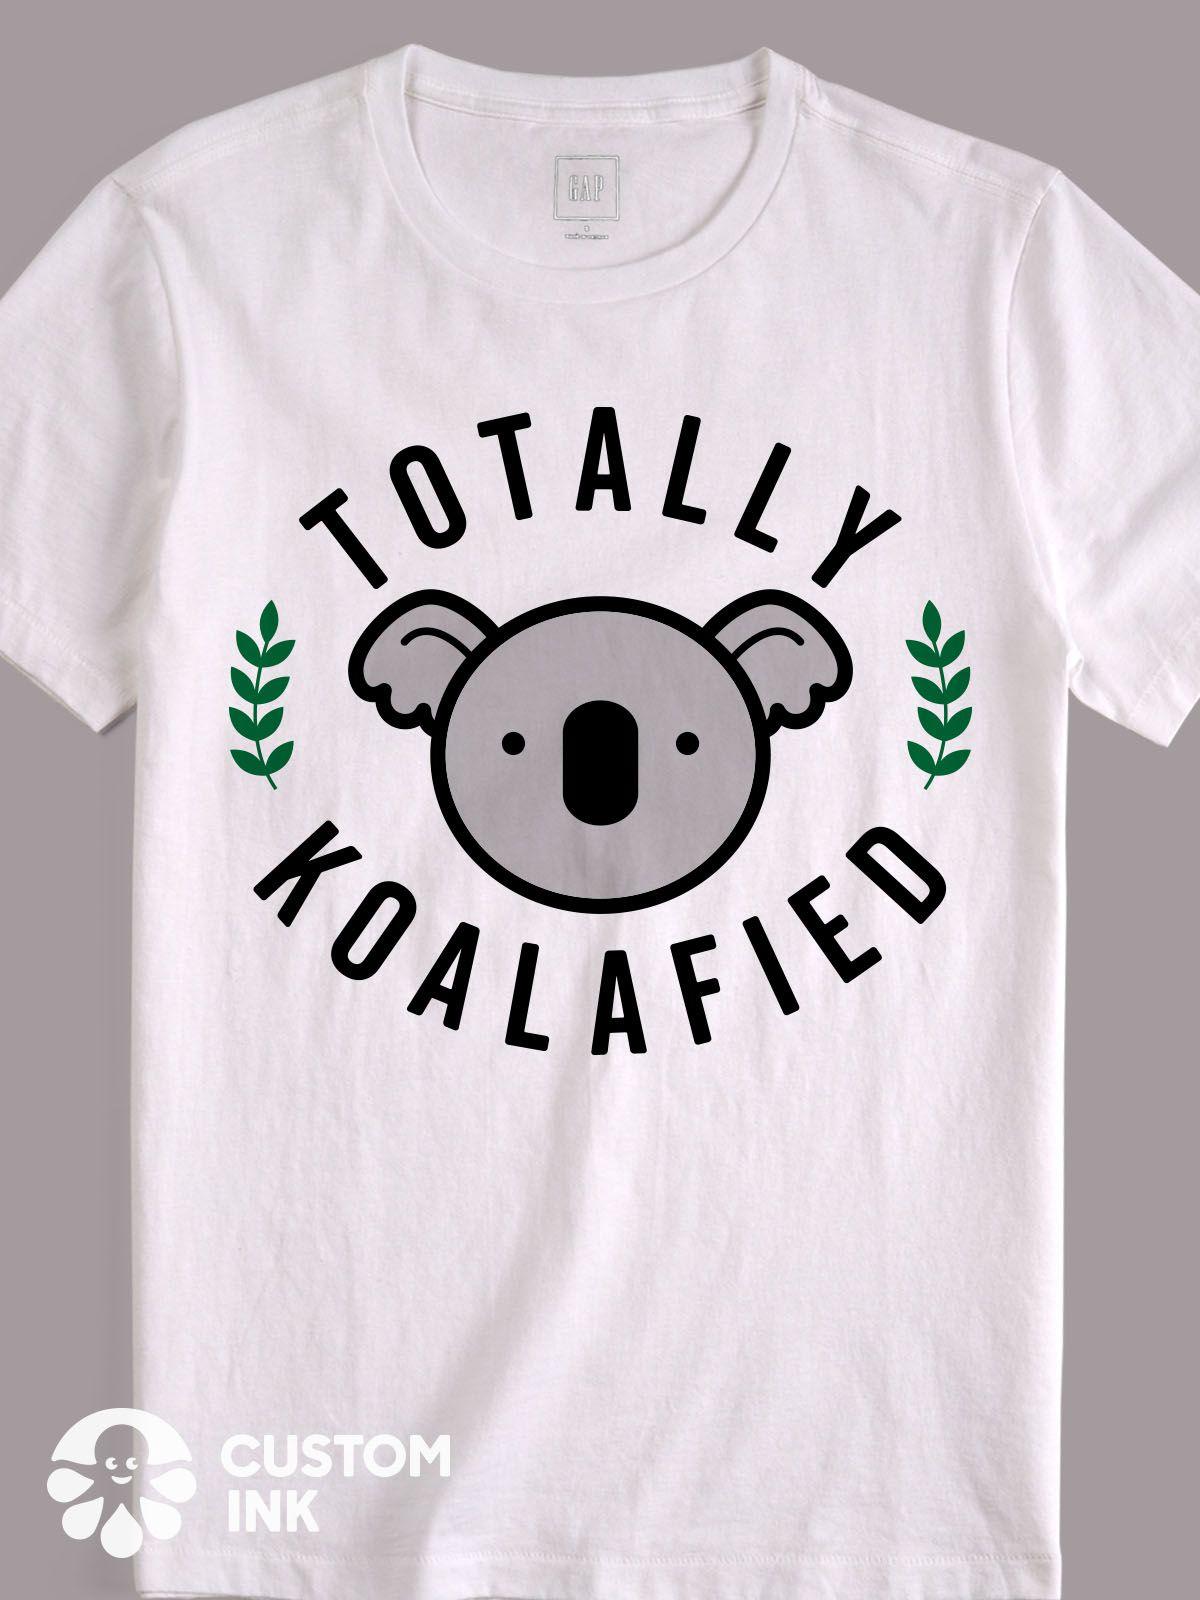 Totally Koalafied Is The Perfect Funny Saying Design Idea For A Custom T Shirt Tank Top Hoodie Mug Tote Bag Or More T Shirt Custom Tshirts Shirt Designs